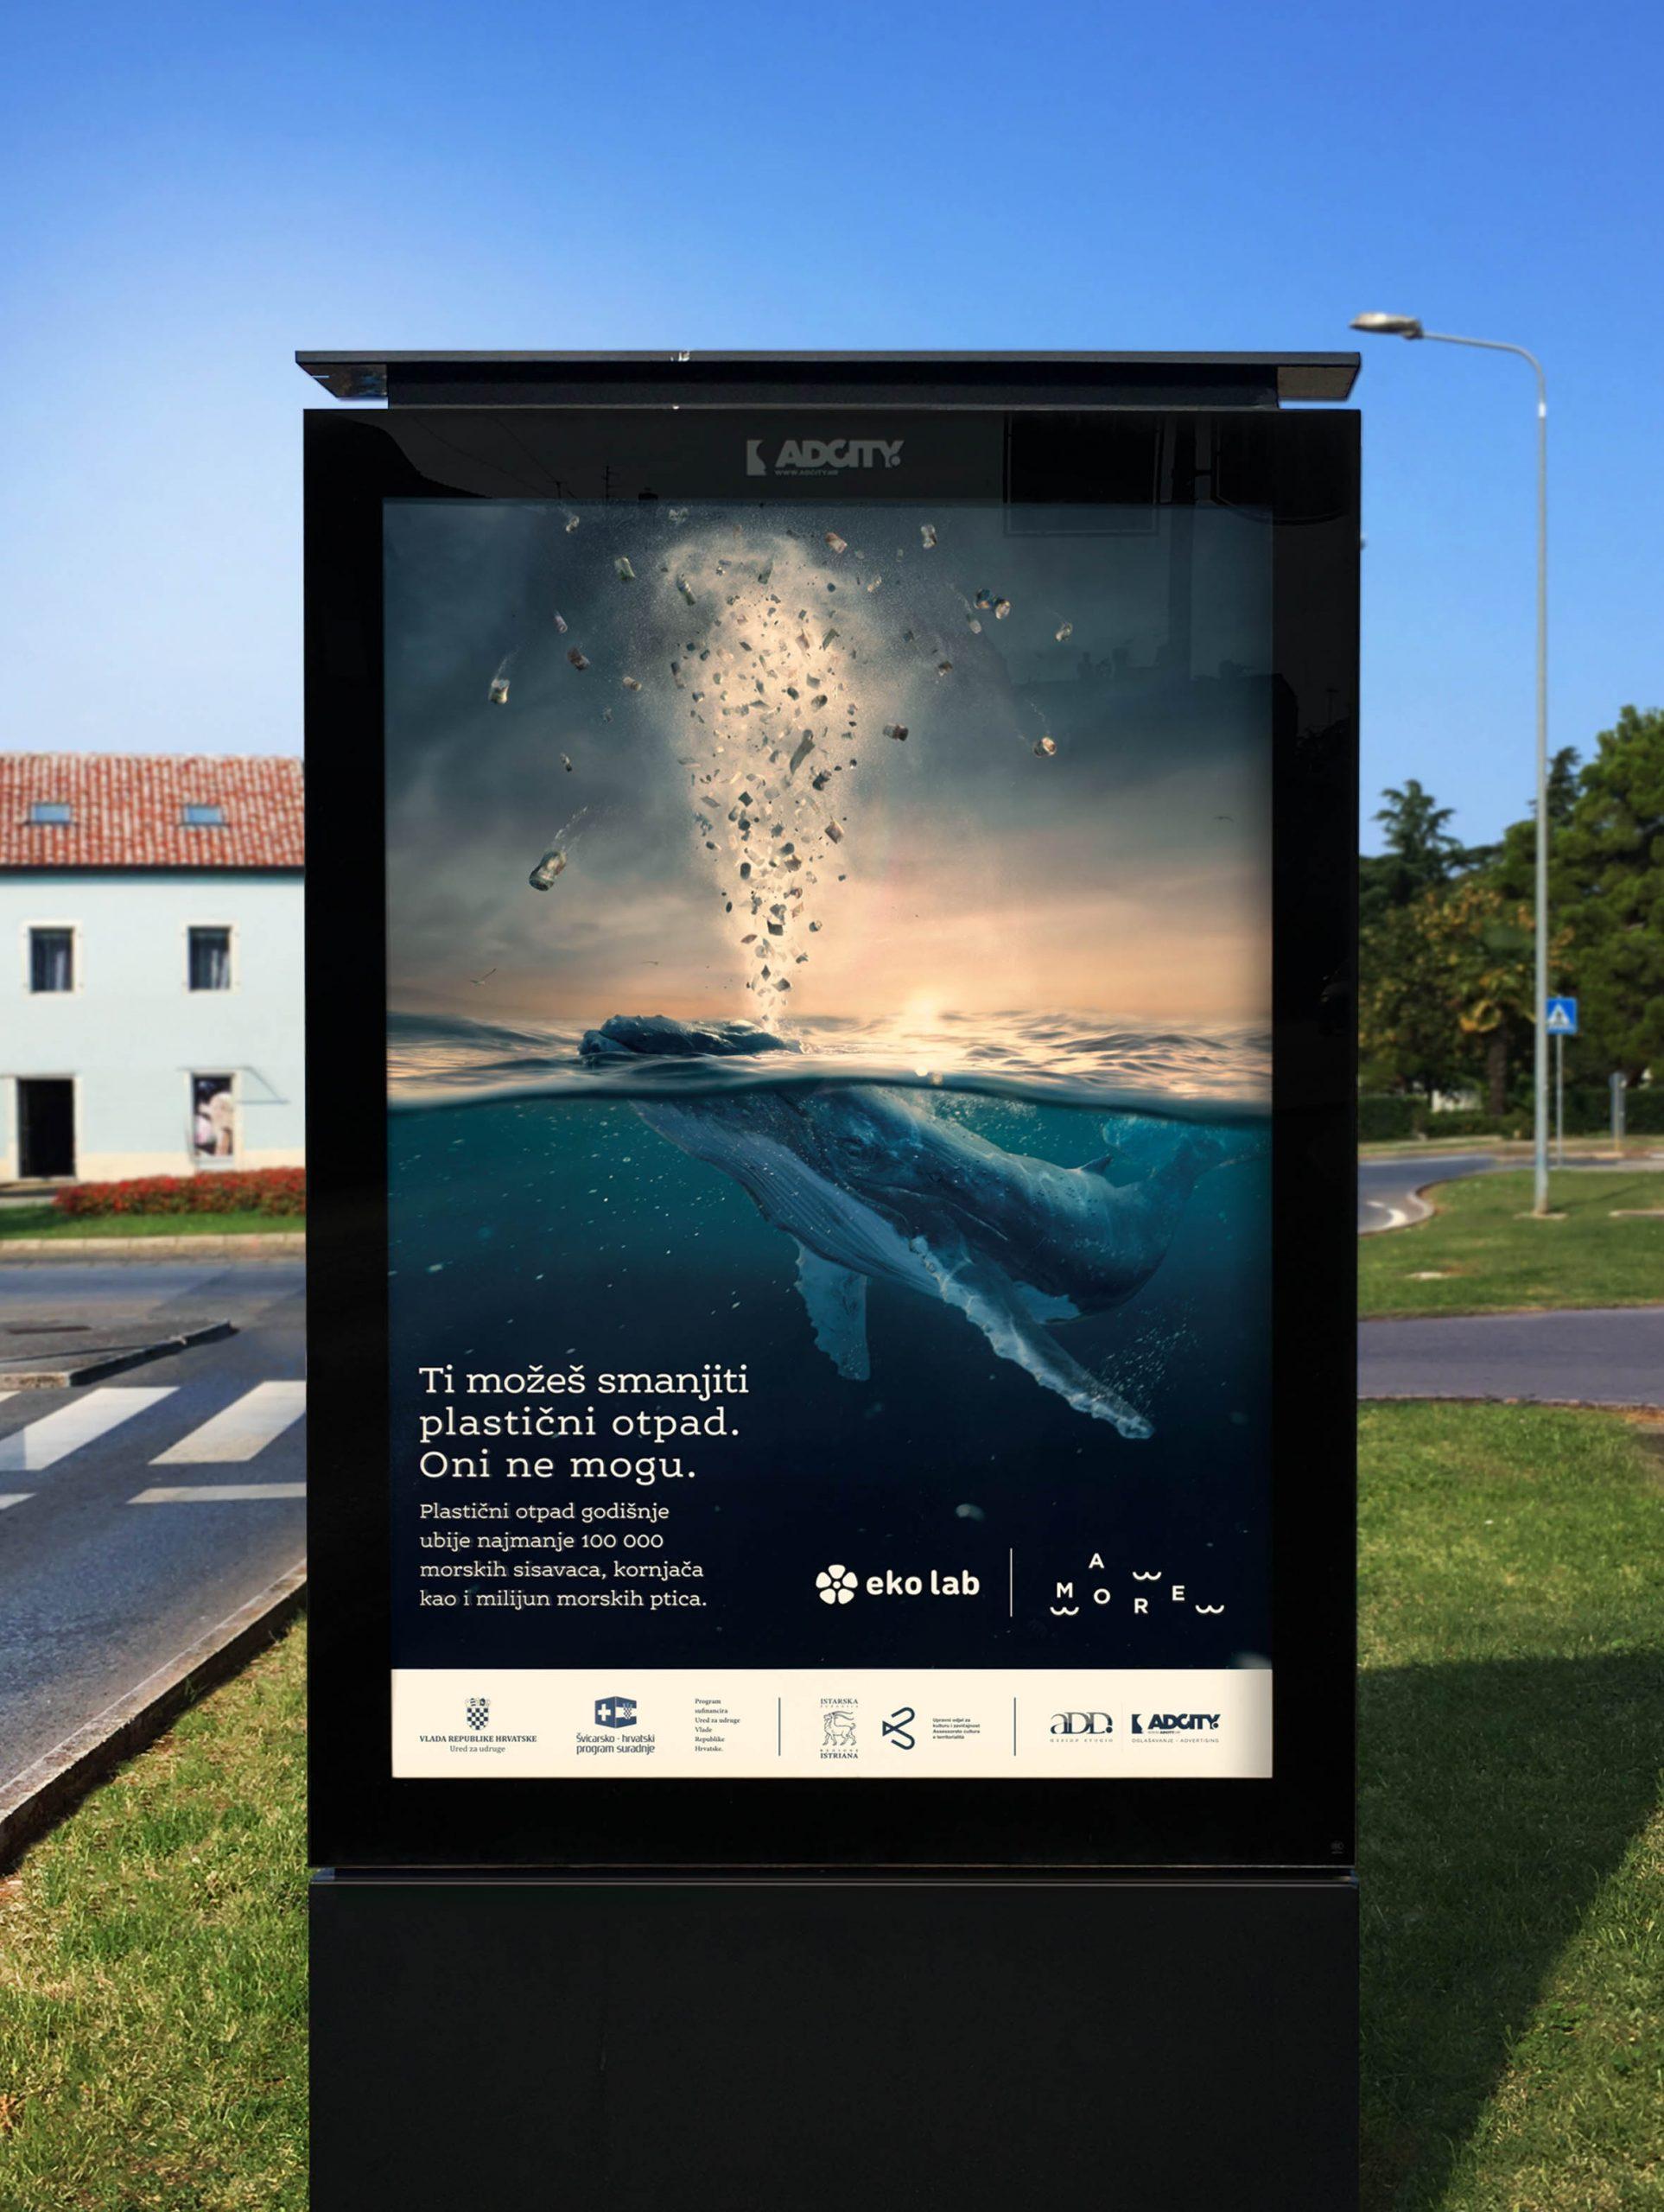 Trumpić/Prenc has won the European Green Award